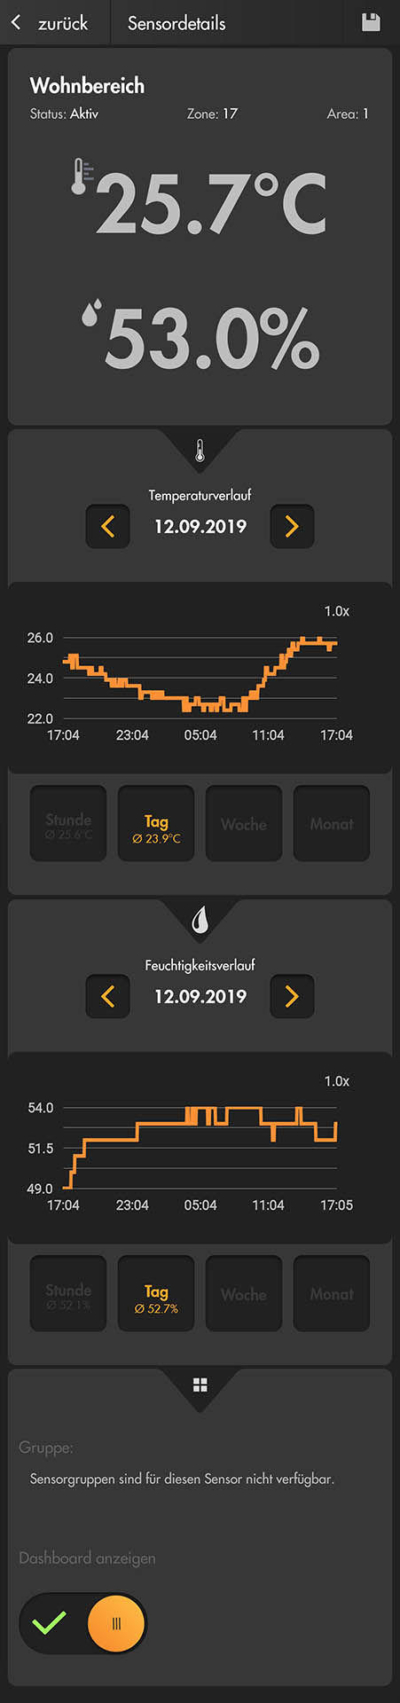 LUPUS ZigBee Mini Temperatursensor_12134_3